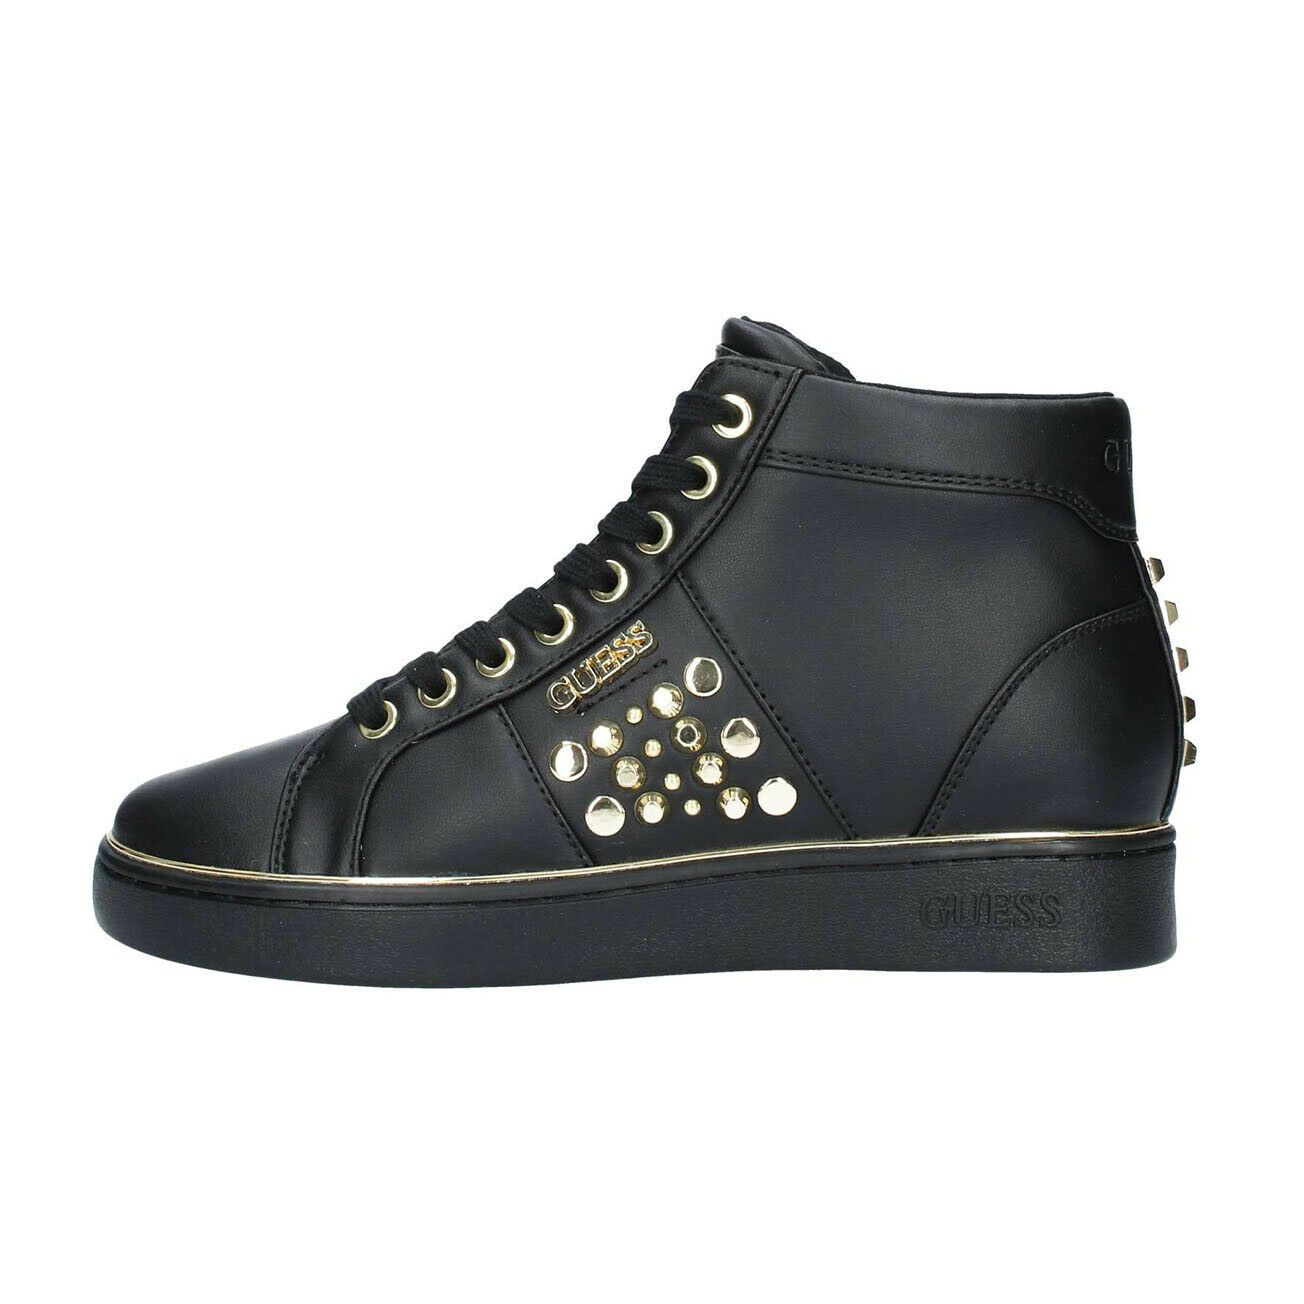 adidas borchie donna scarpe